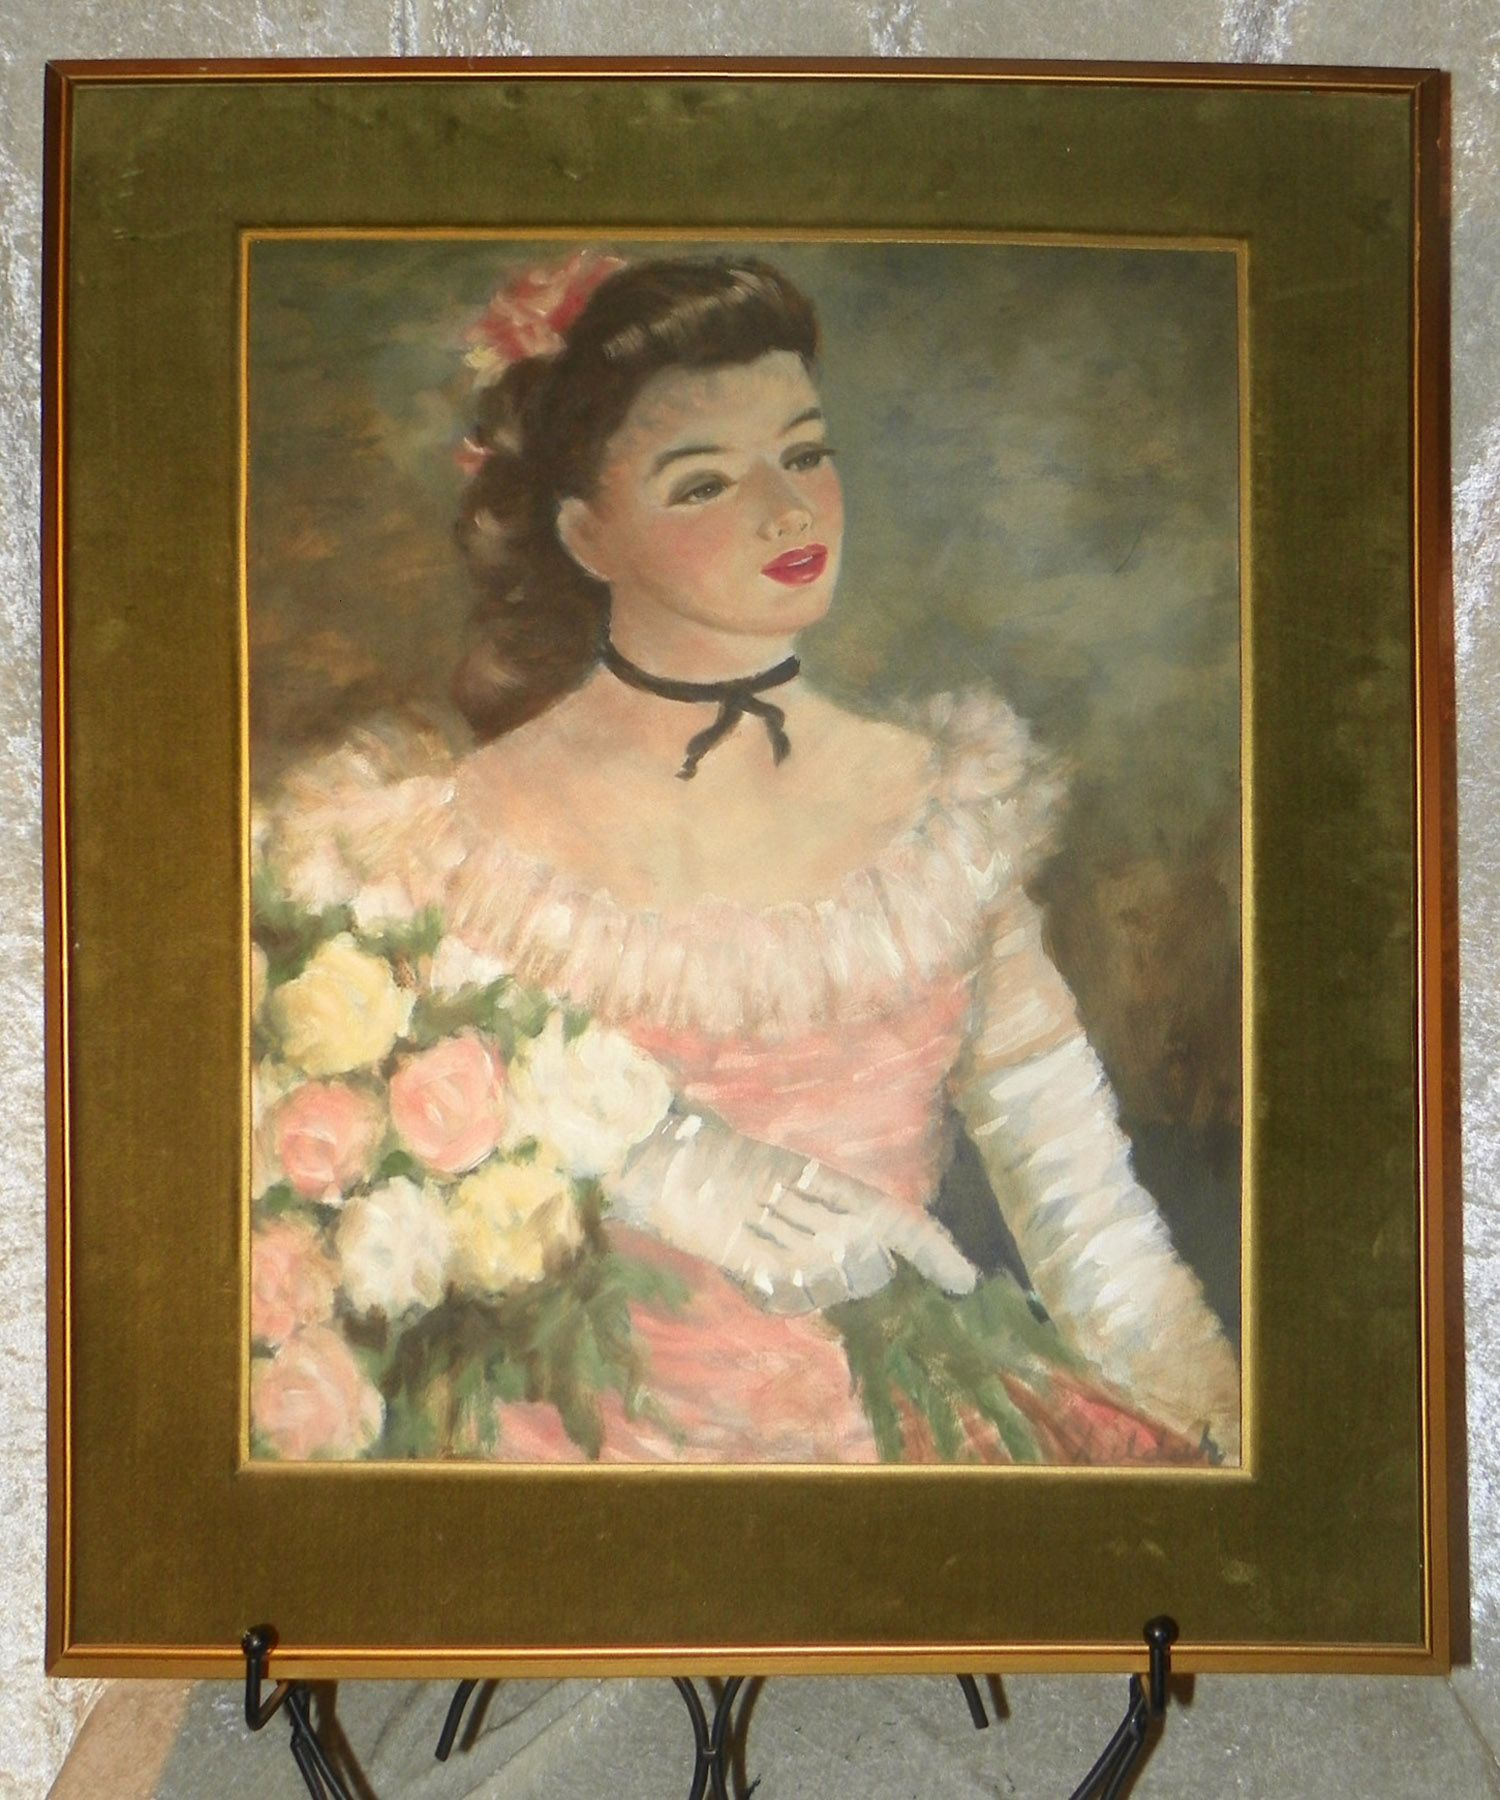 Painting by Huldah Cherry Jeffe - Beautiful Ballerina in Pink - Original  Artwork - Large -